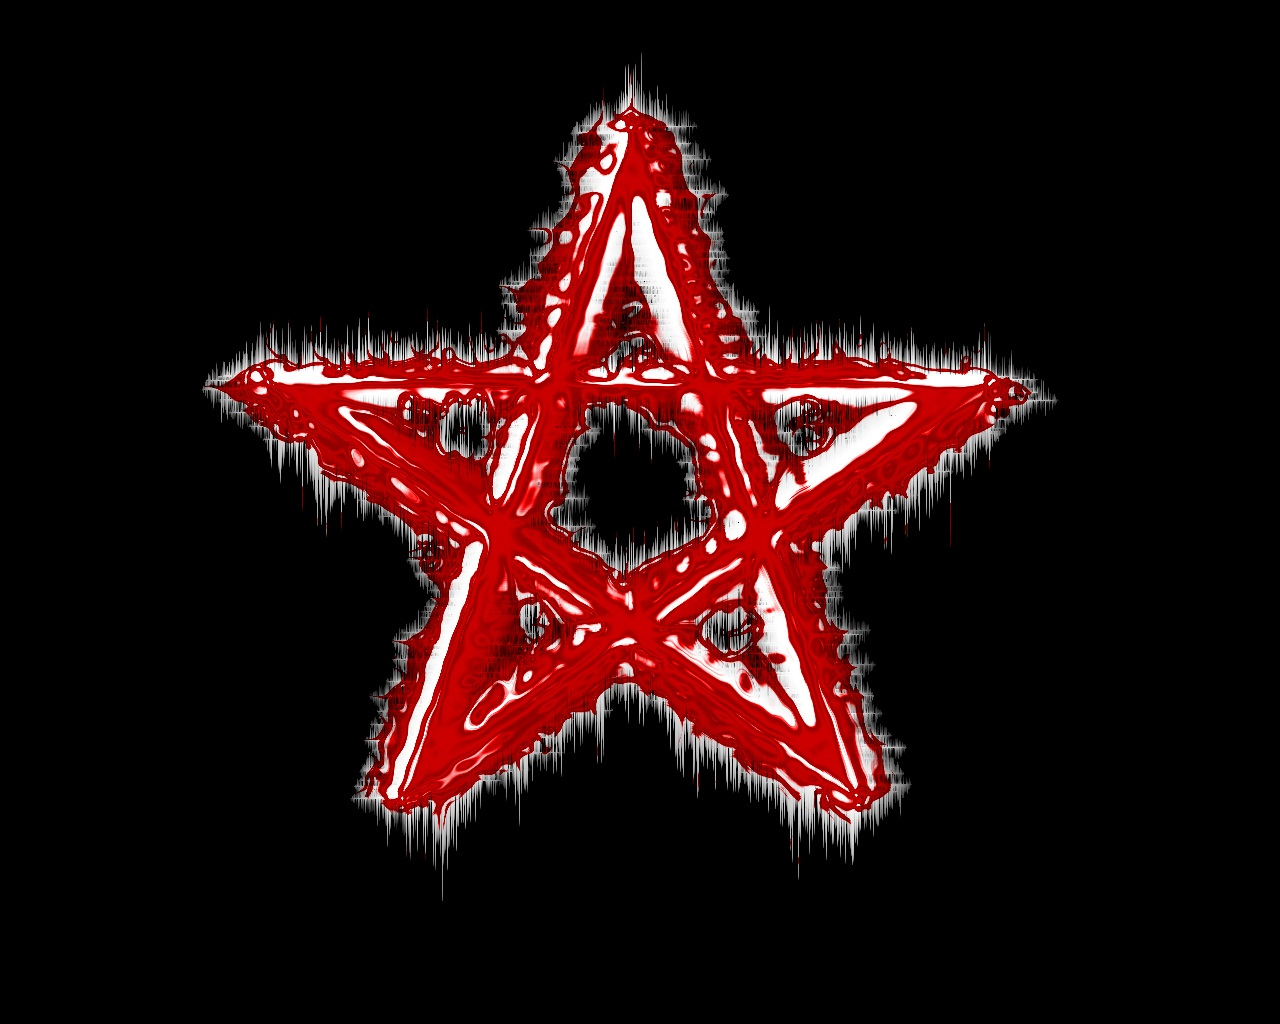 http://1.bp.blogspot.com/-FD2VJQAVYc8/TeZO-z33BBI/AAAAAAAACco/zUPR4a3urgw/s1600/pentagram_1.jpg